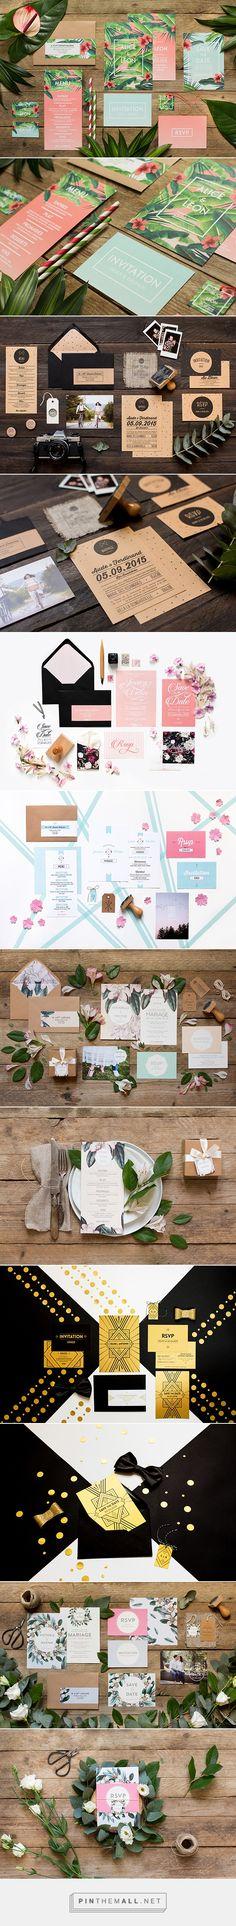 Shooting stylisme pour My Dear Paper - Hochzeitseinladungen Web Design, Book Design, Layout Design, Print Design, Corporate Design, Identity Design, Visual Identity, Communication Design, Design Graphique